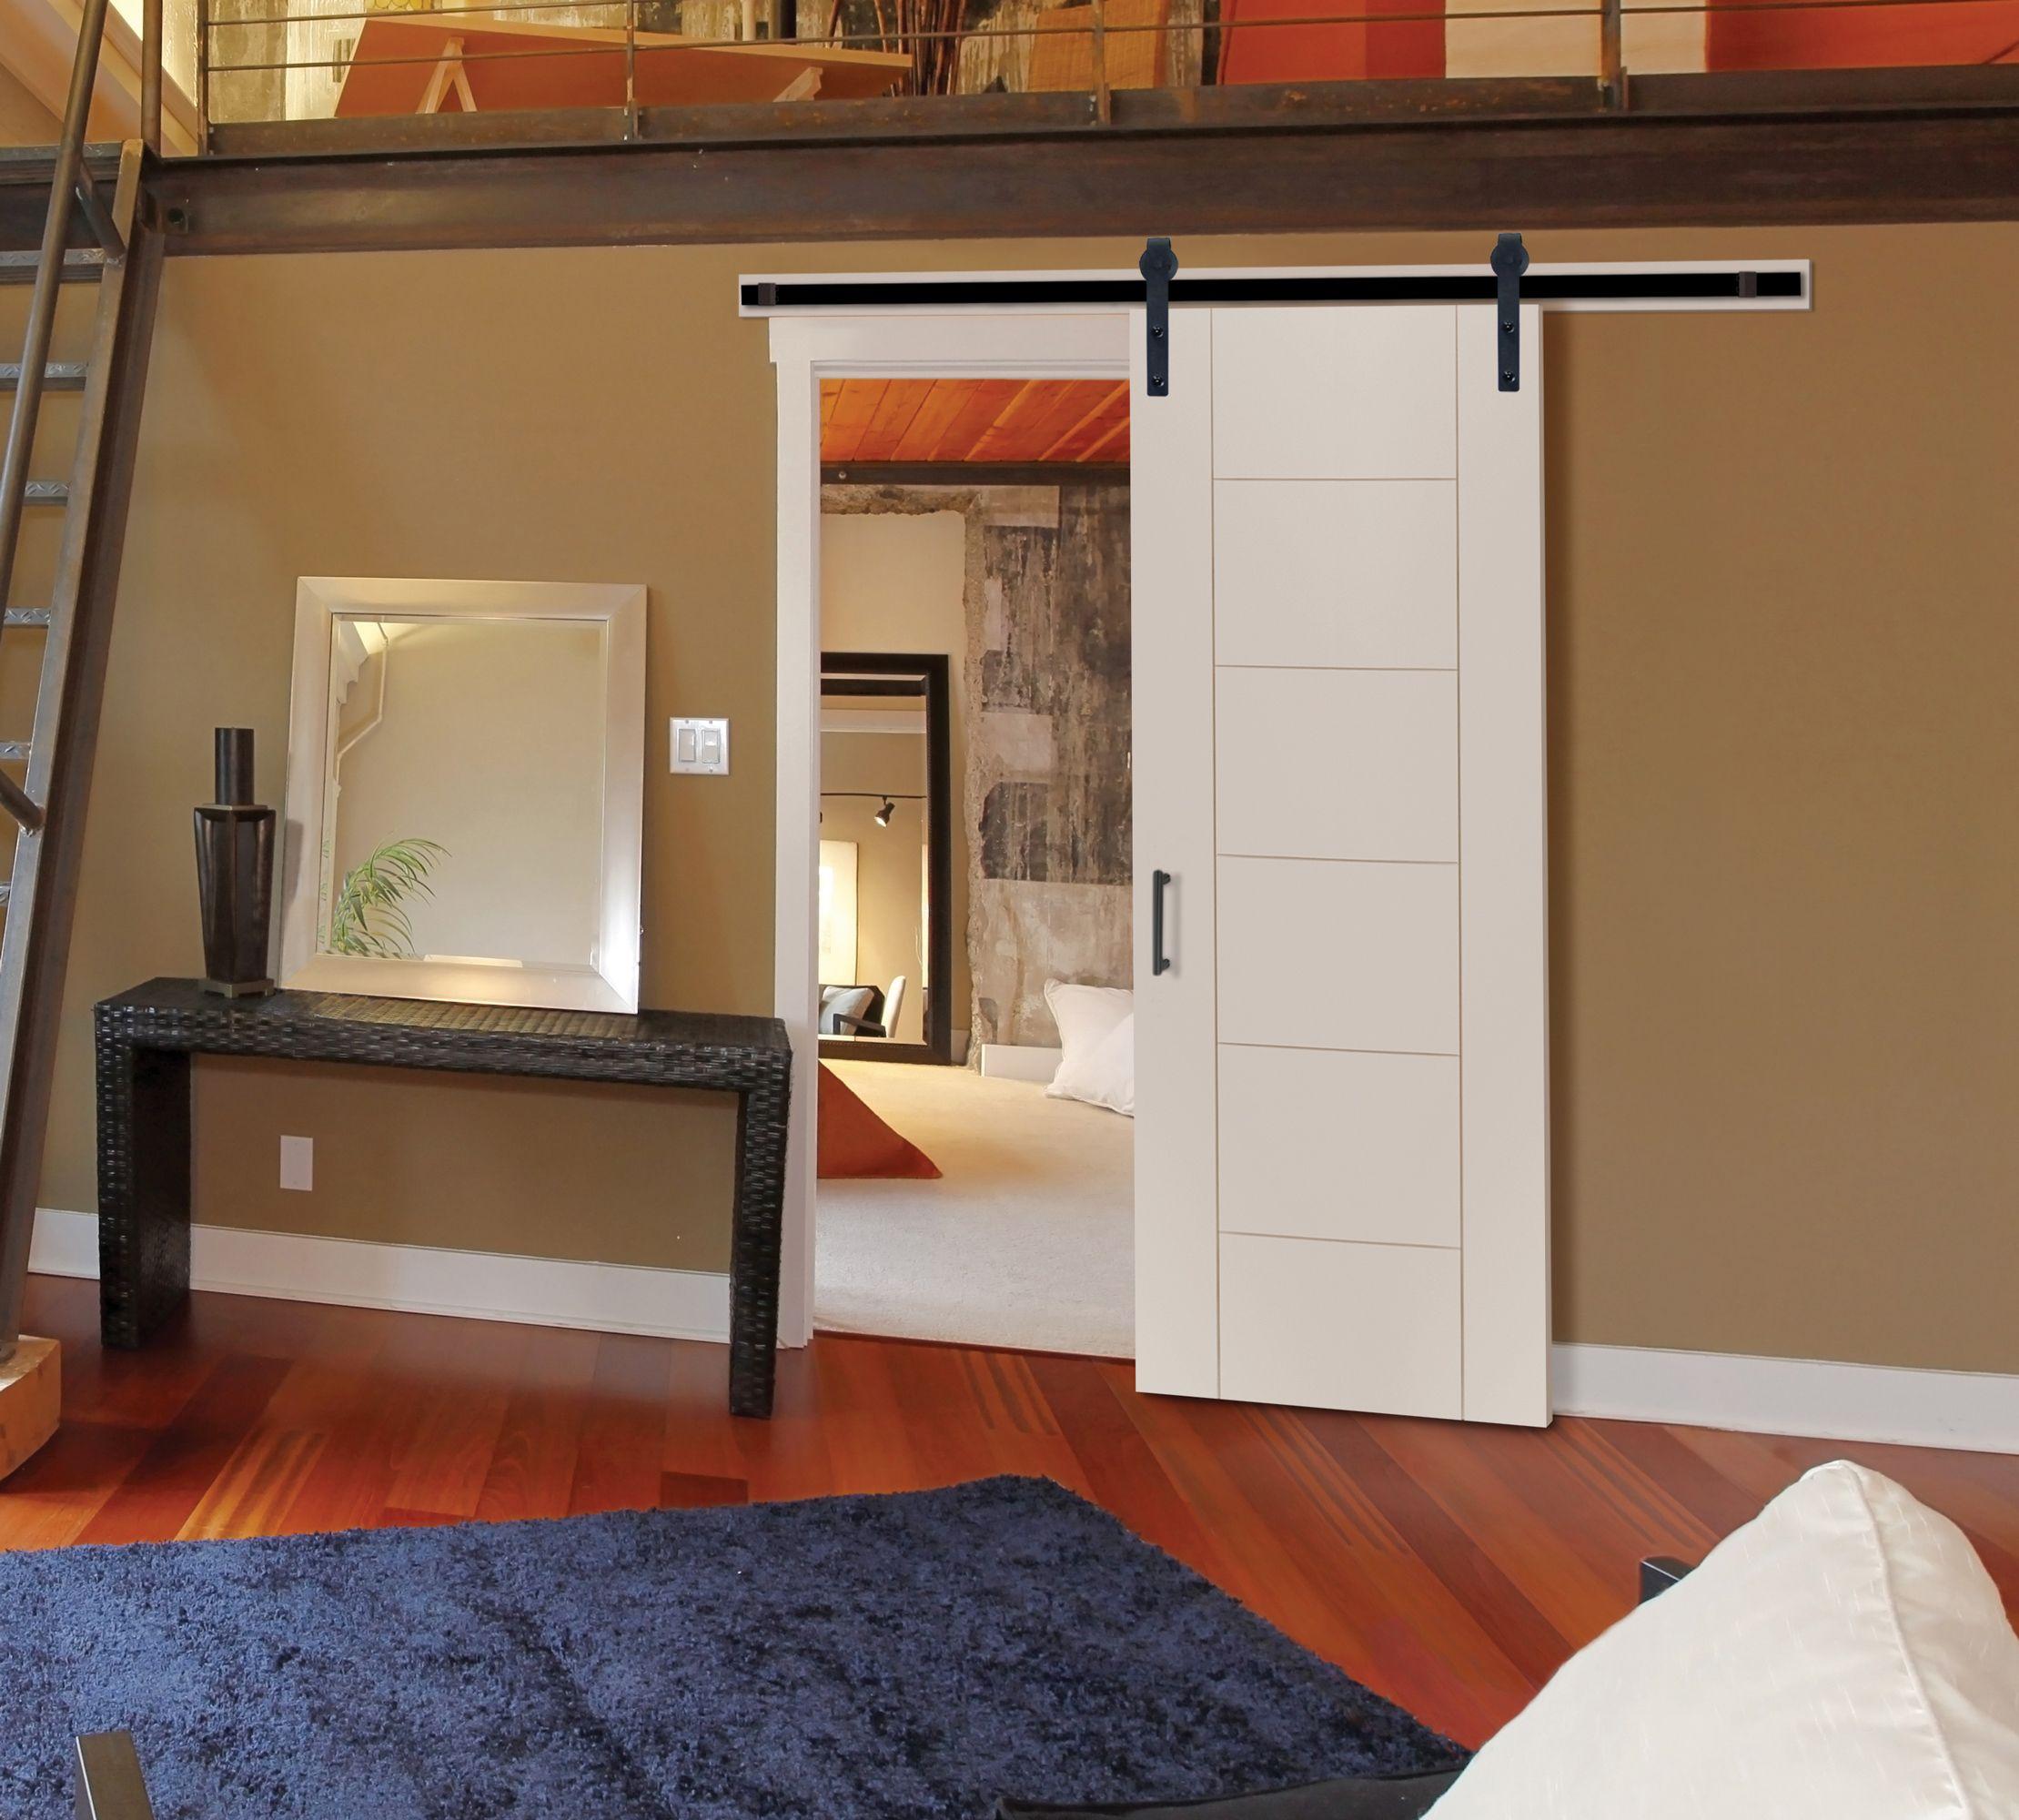 door bifold ideas folding exterior contemporary wood interior closet glass l alternatives bypass charming style to doors surprising alternative sliding barn